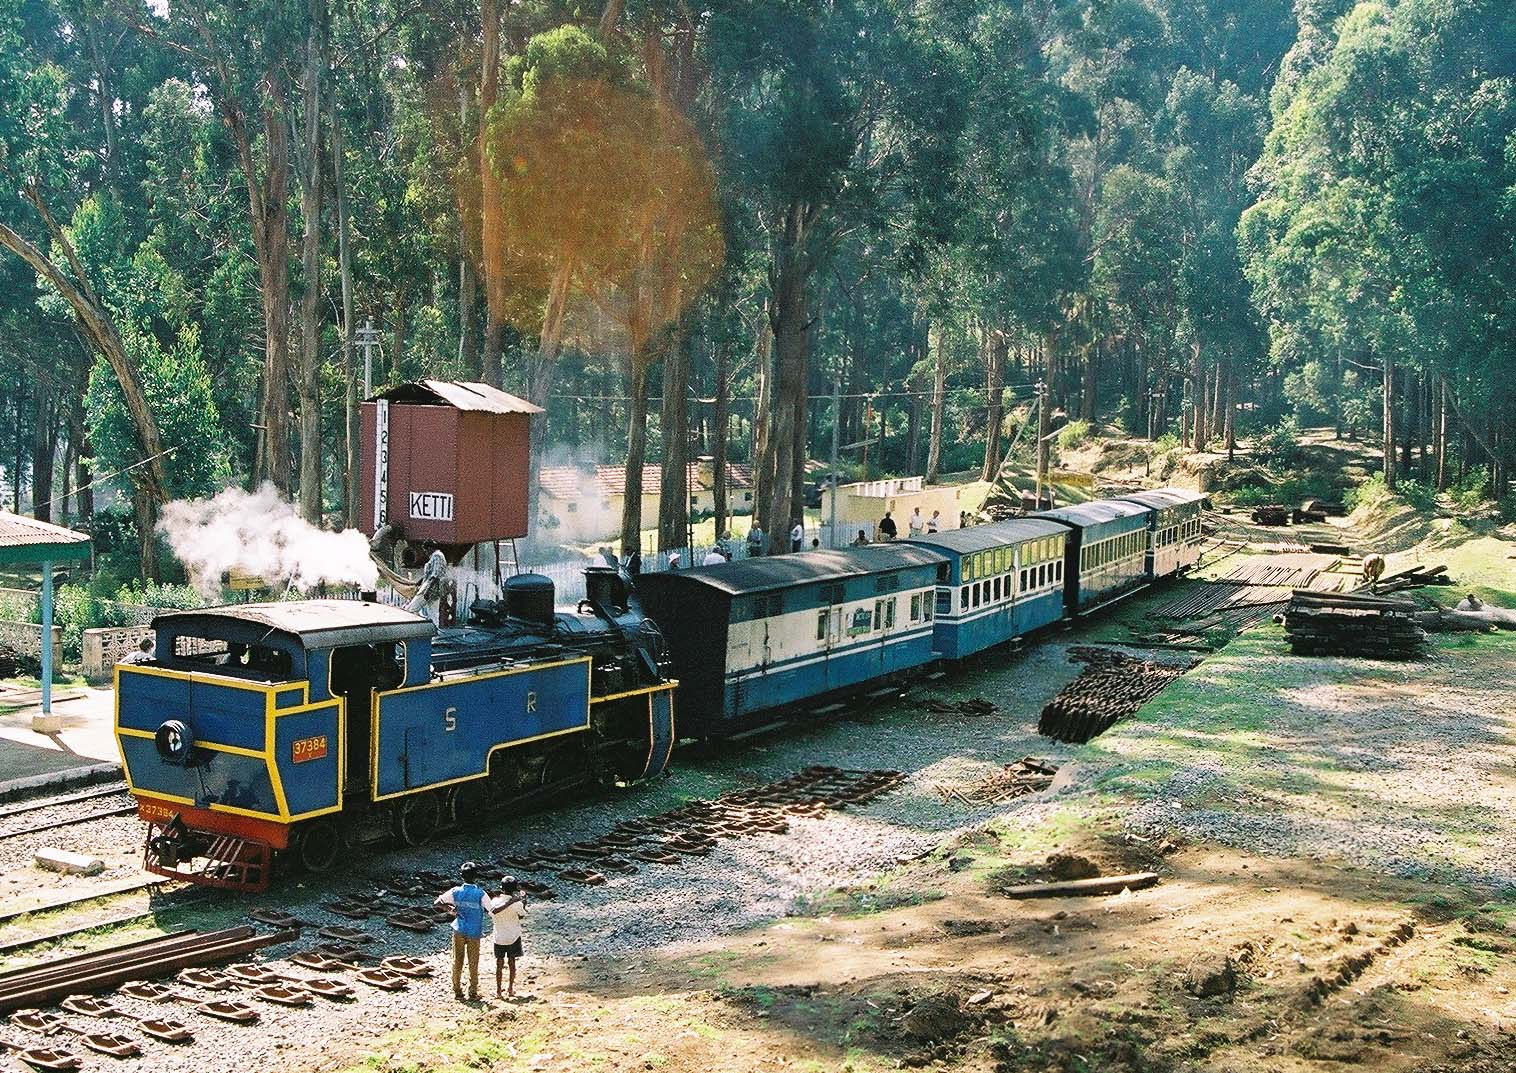 The Nilgiri Passenger at Ketti Railway Station